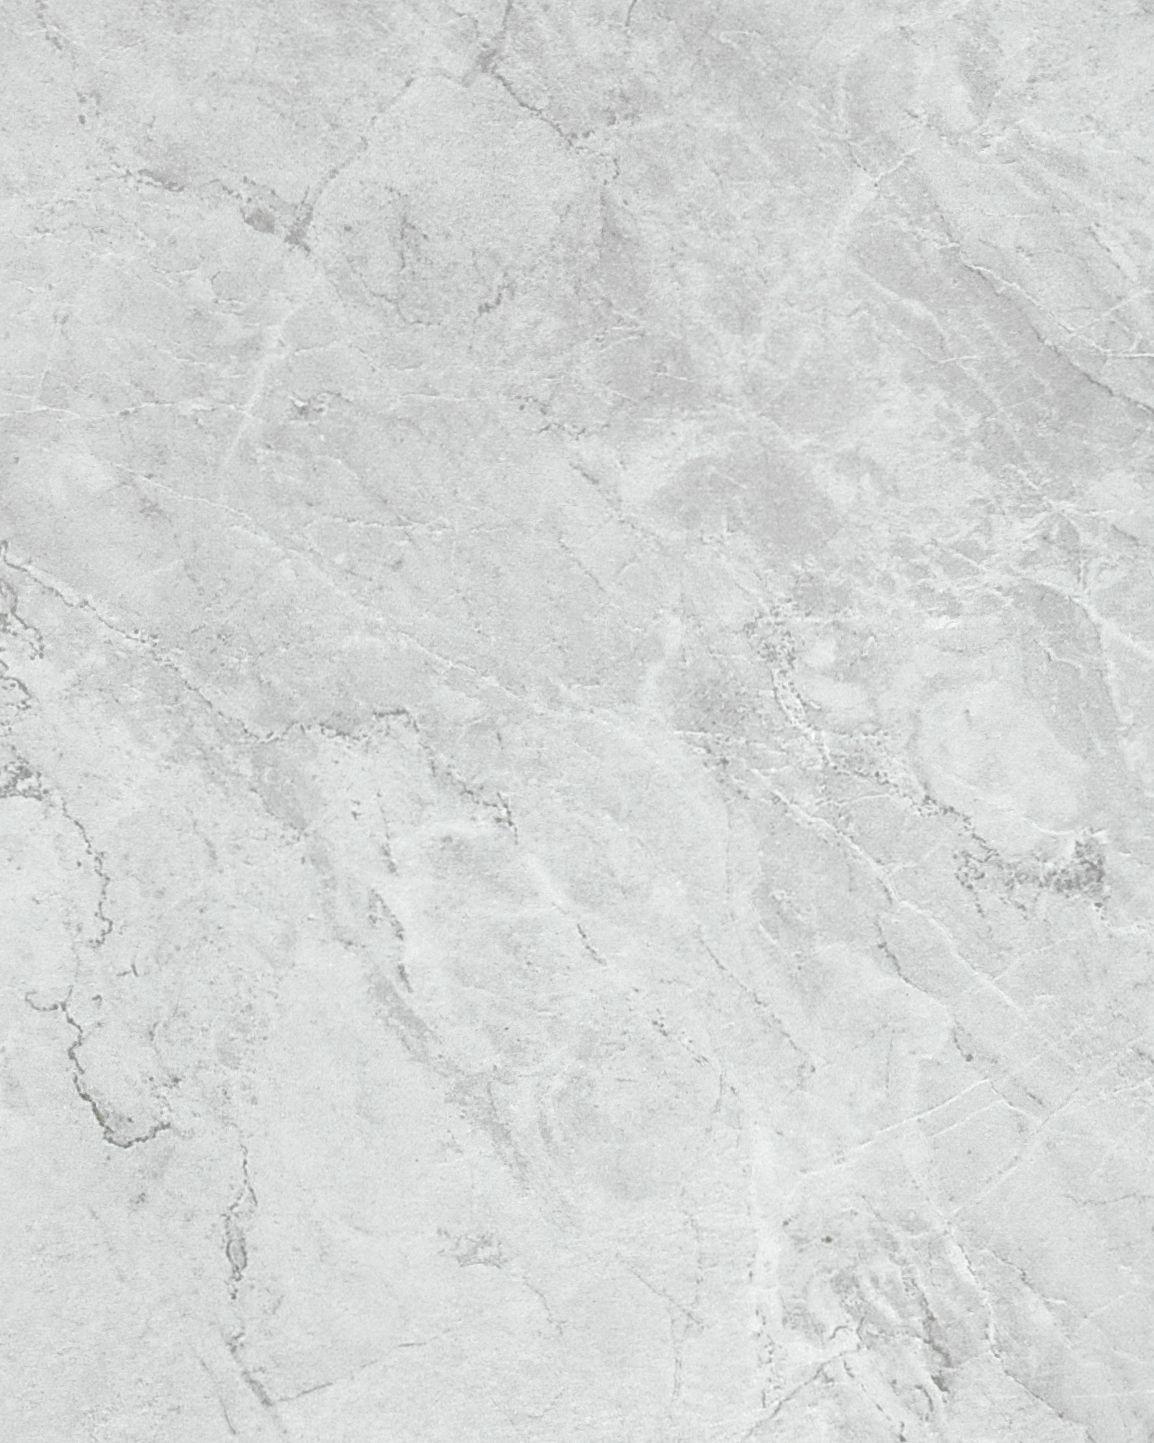 malena ice 8 x10 wall tile tile ceramic textures pinterest. Black Bedroom Furniture Sets. Home Design Ideas